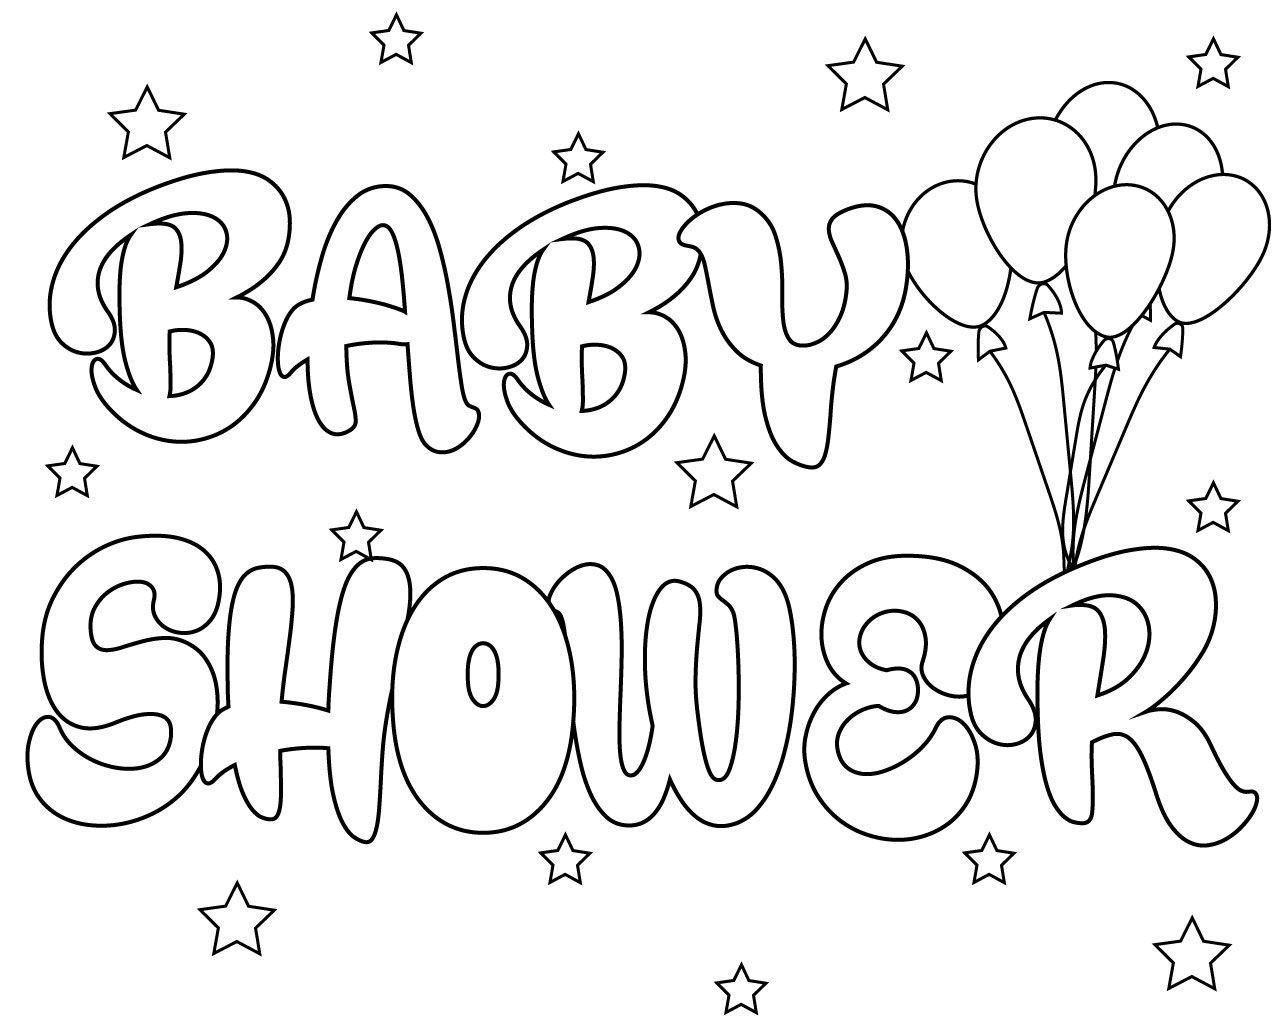 Baby Shower Coloring Pages Print Careersplay Baby Shower Boy Baby Shower Printables Baby Coloring Pages Baby Shower